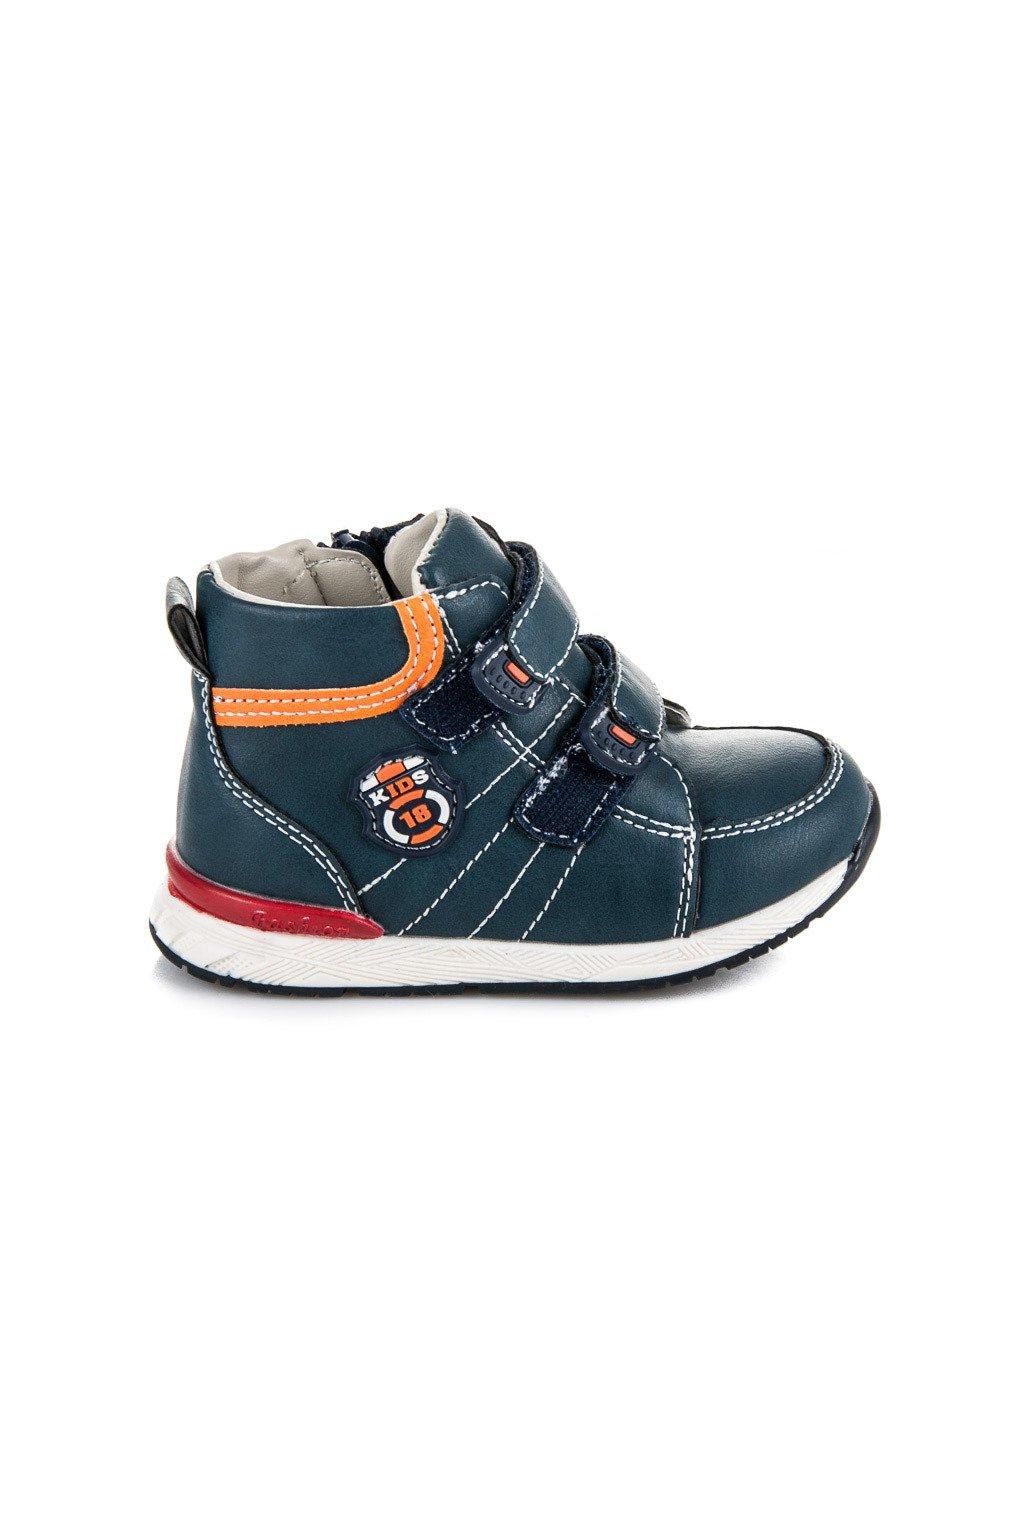 04bea049f8 Topánky pre chlapcov 6013-09BL OR